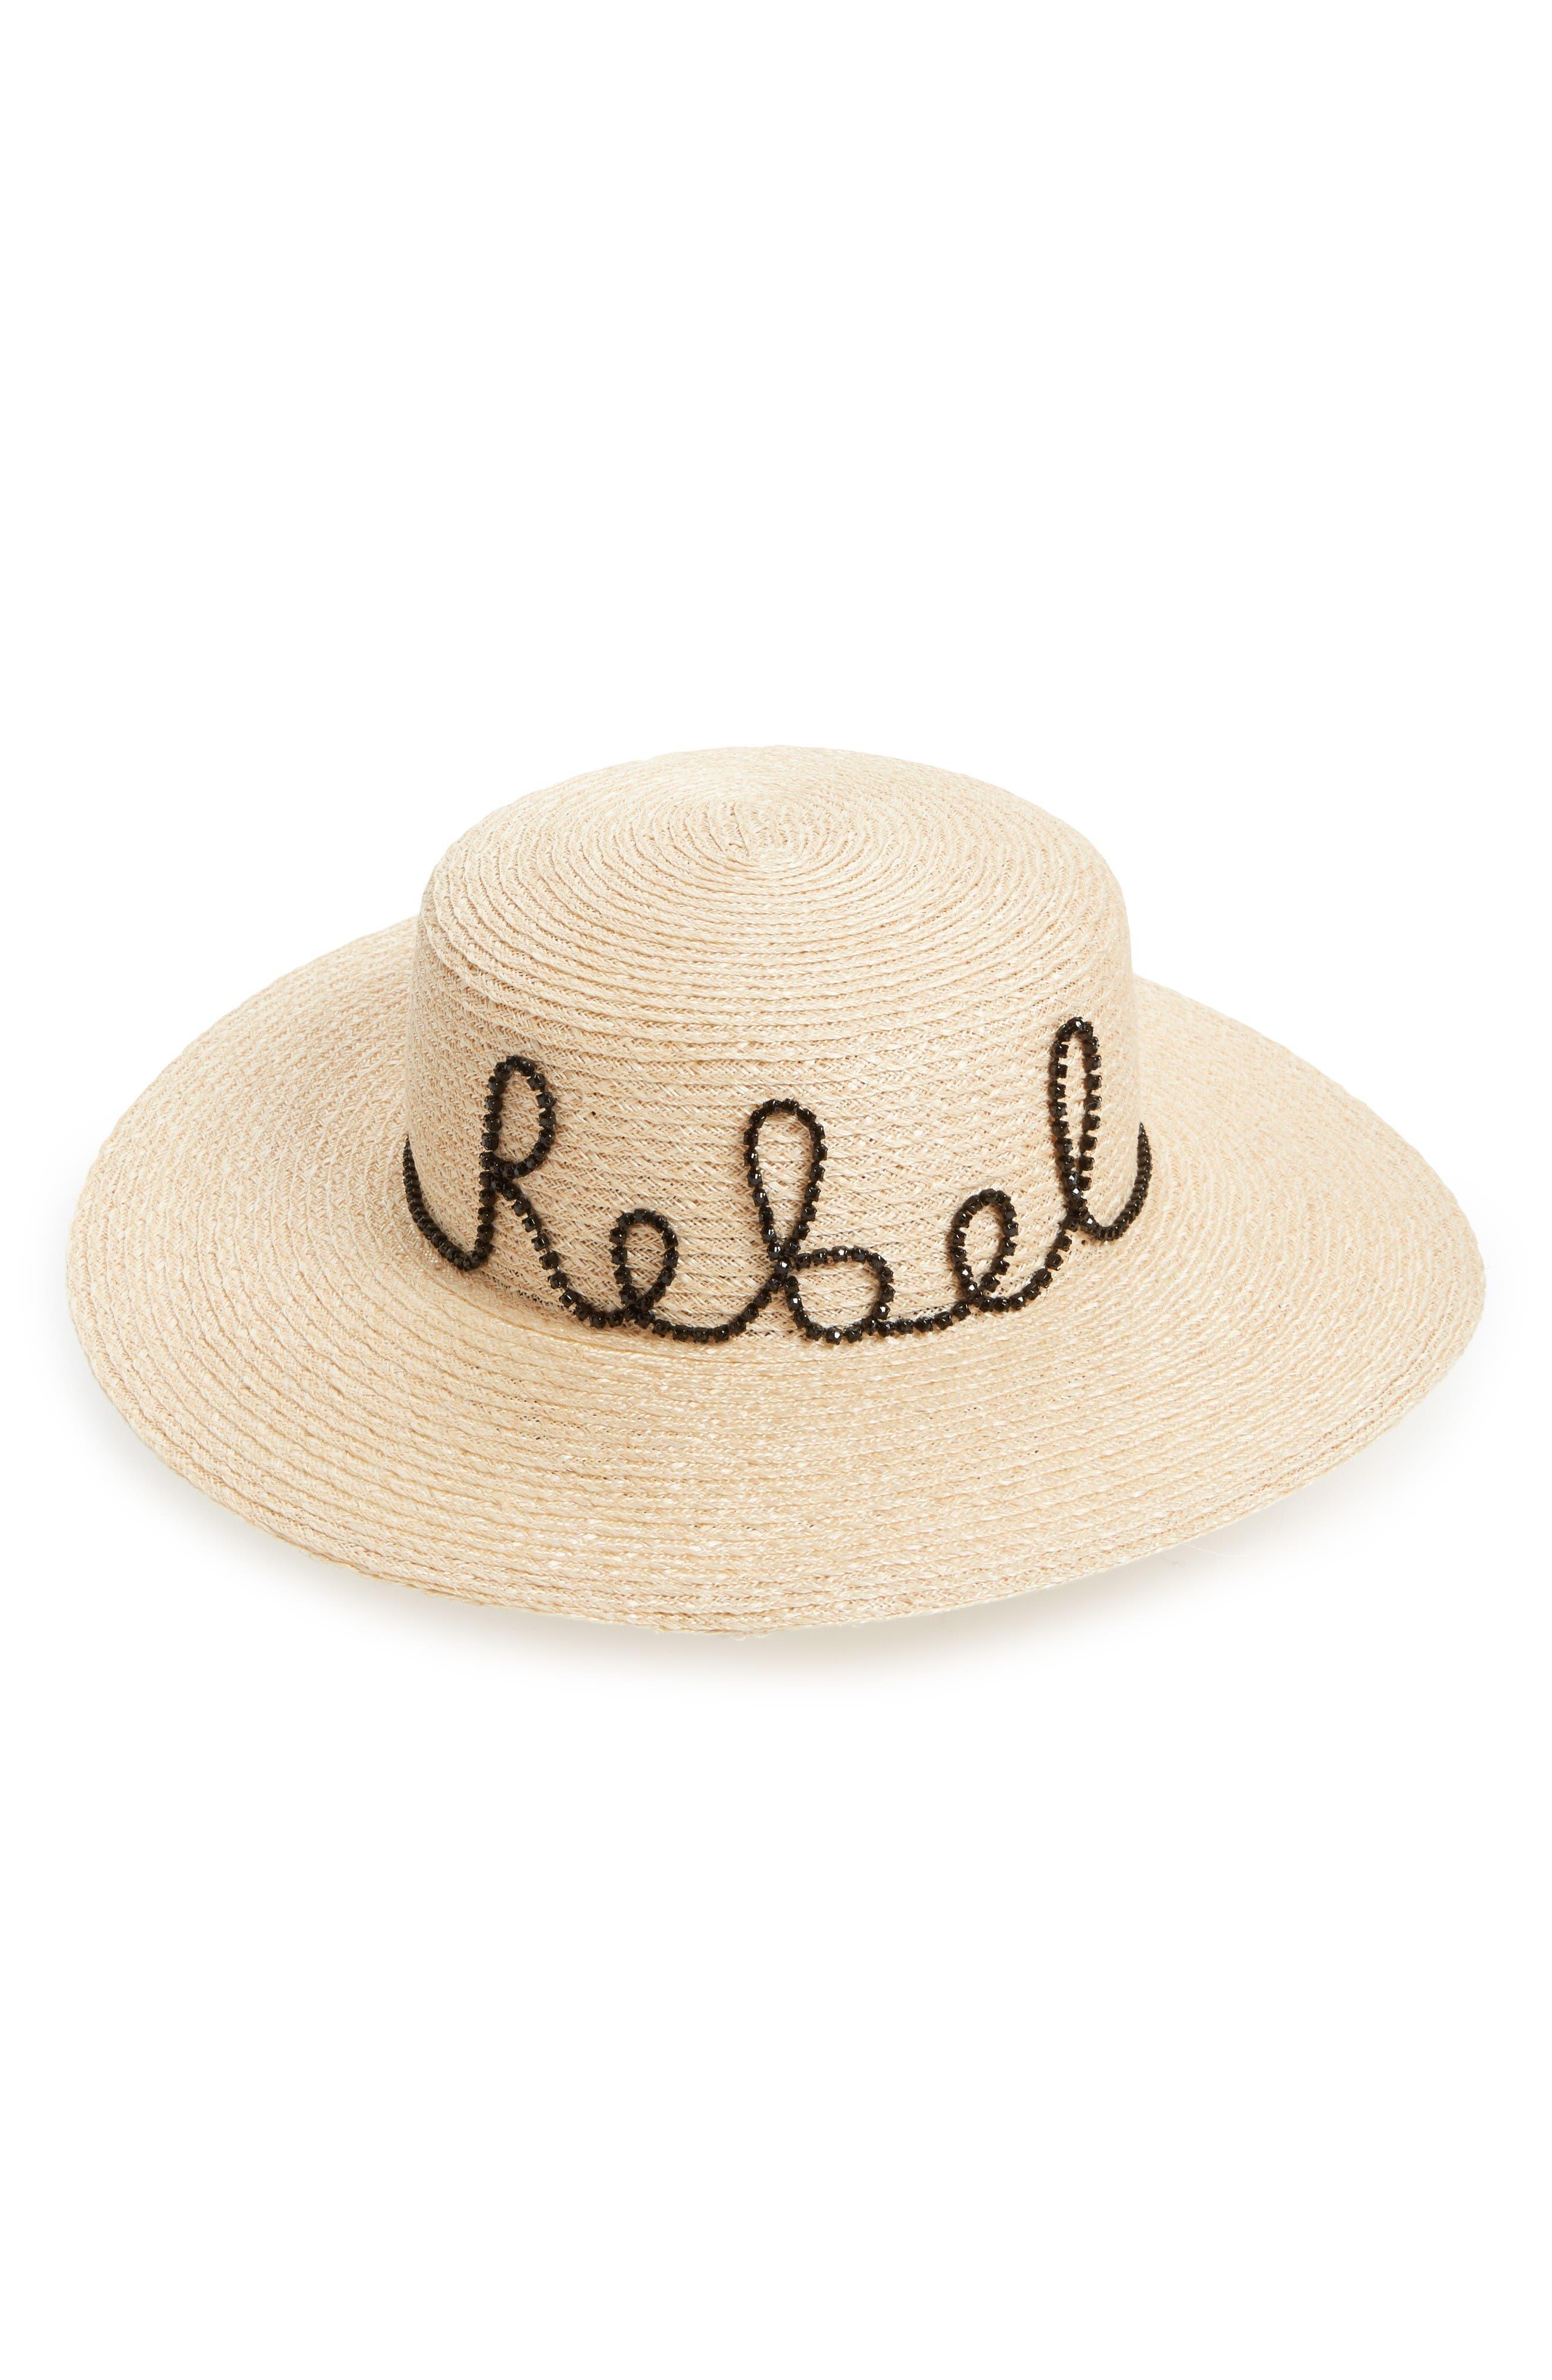 Main Image - Eugenia Kim Colette Rebel Boater Hat